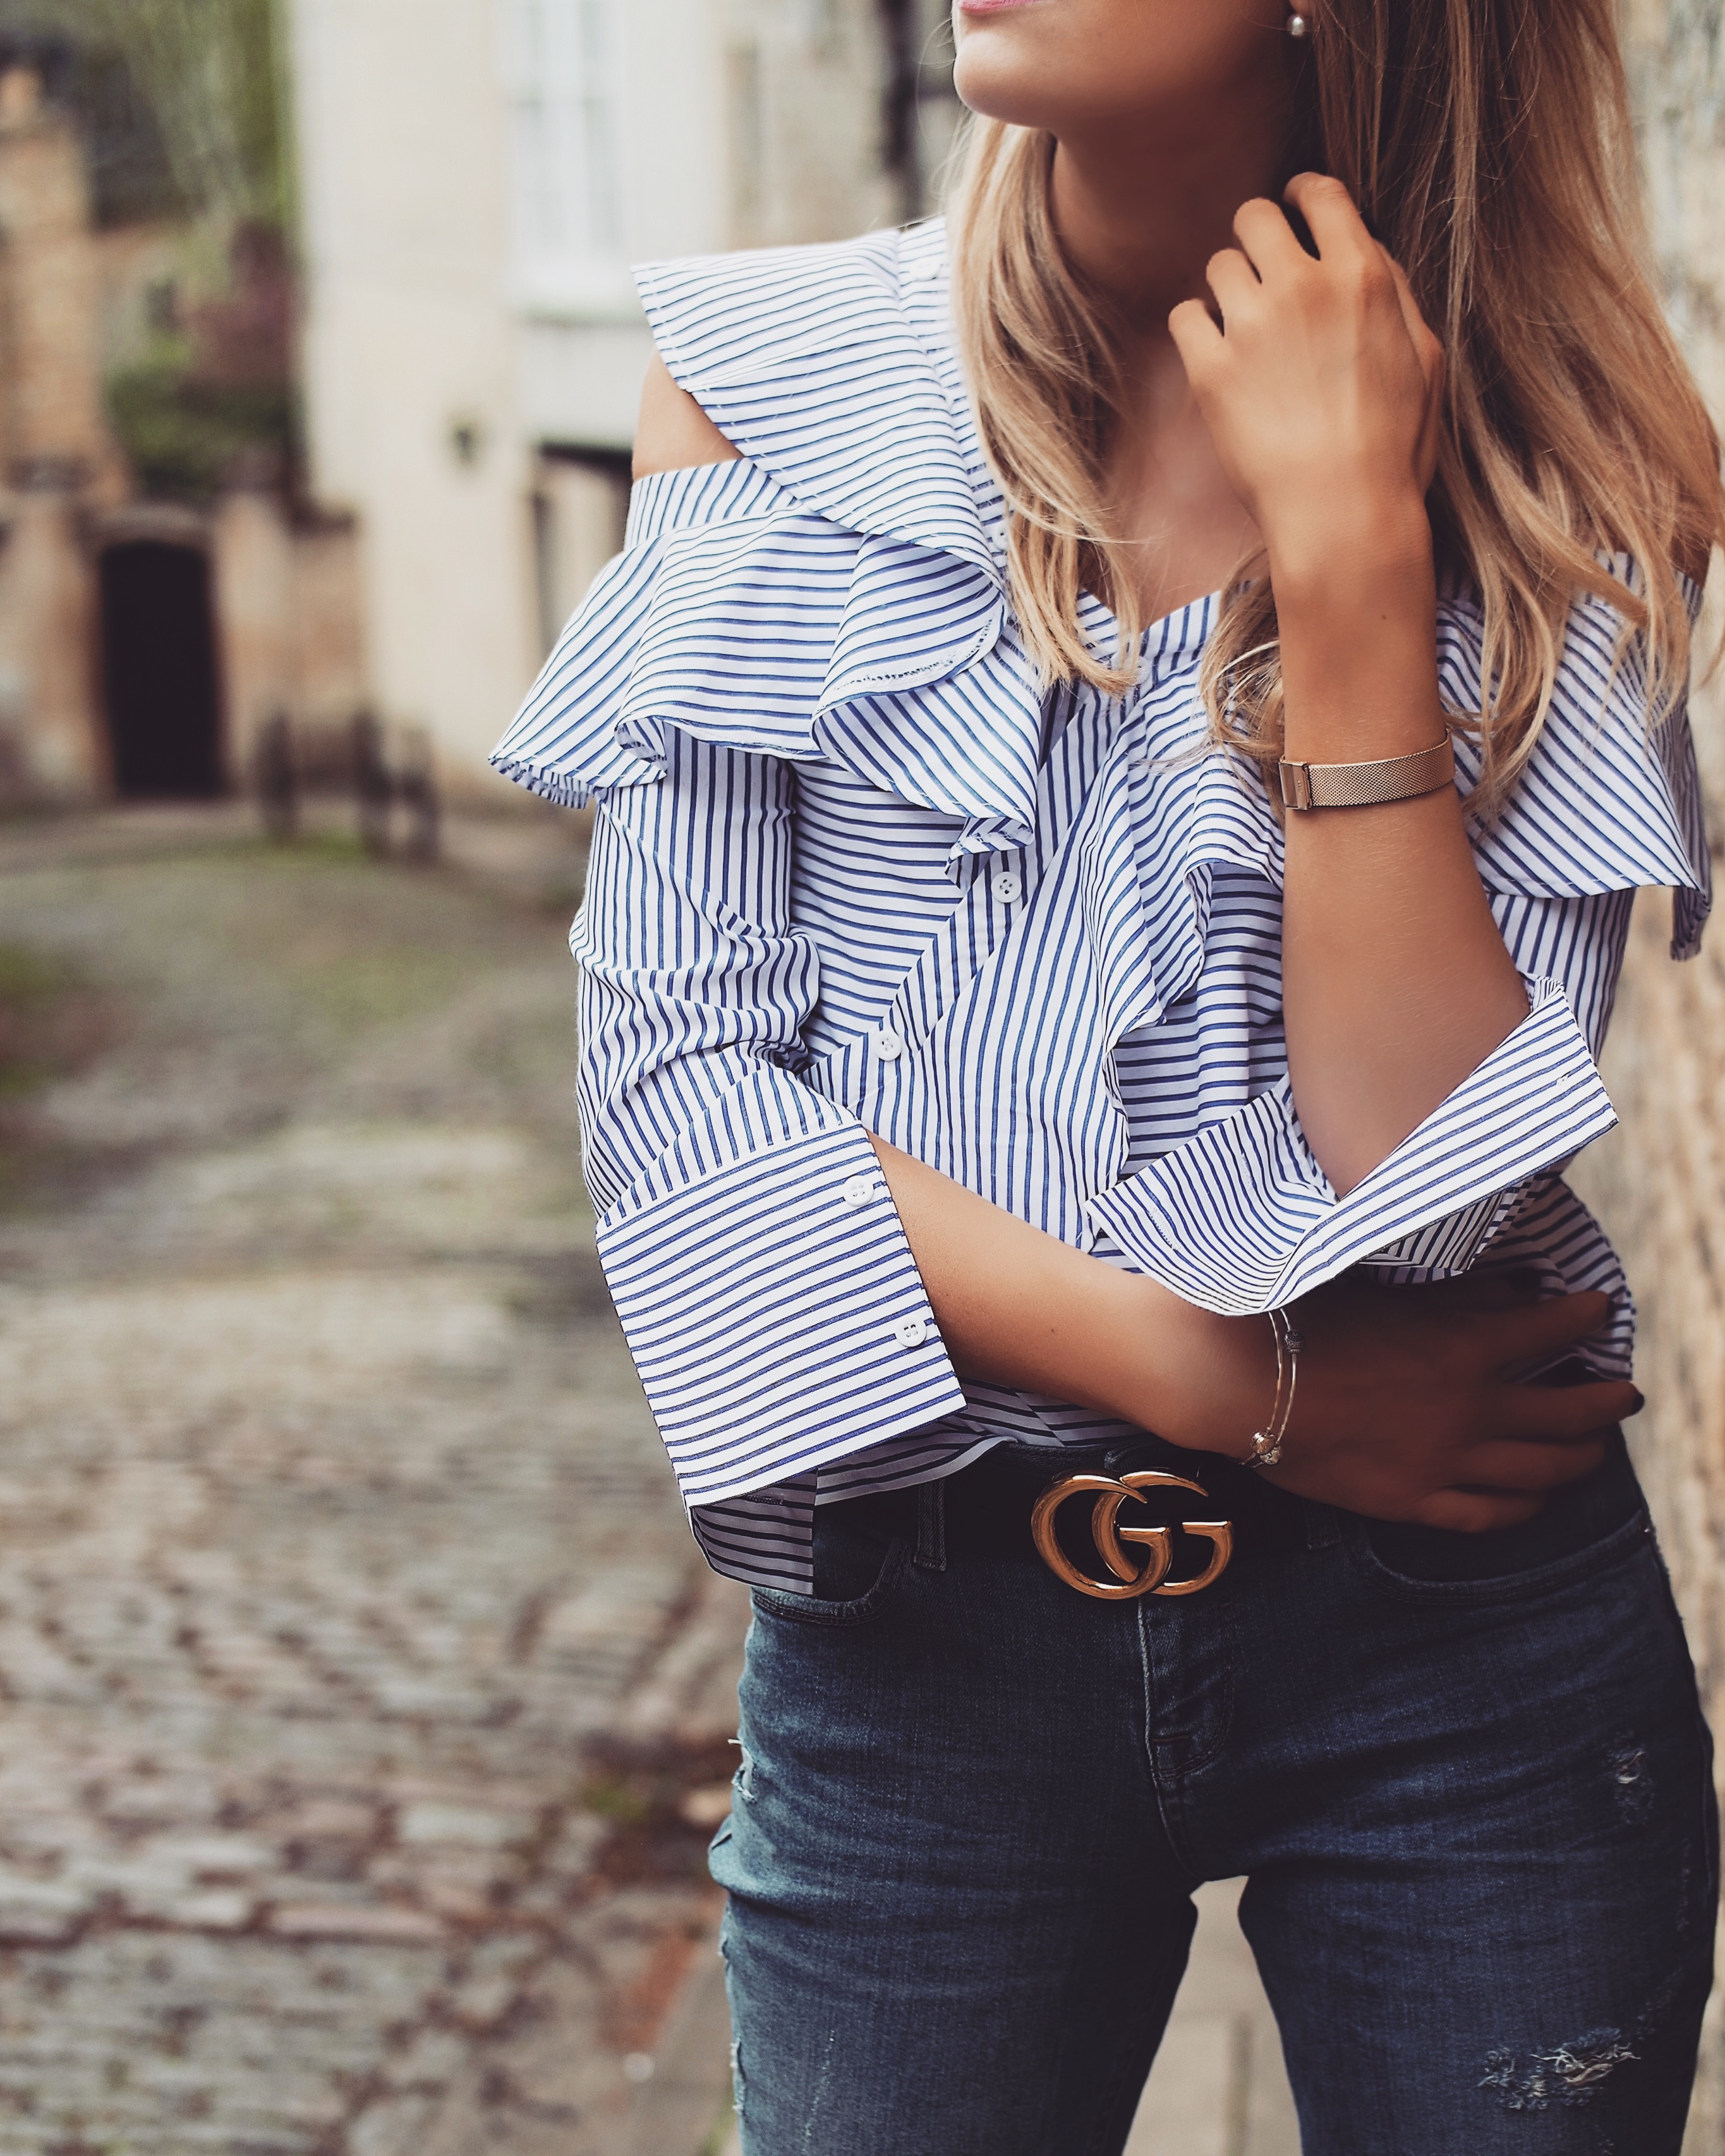 £15 Self Portrait Dupe - Fashion Blogger Style